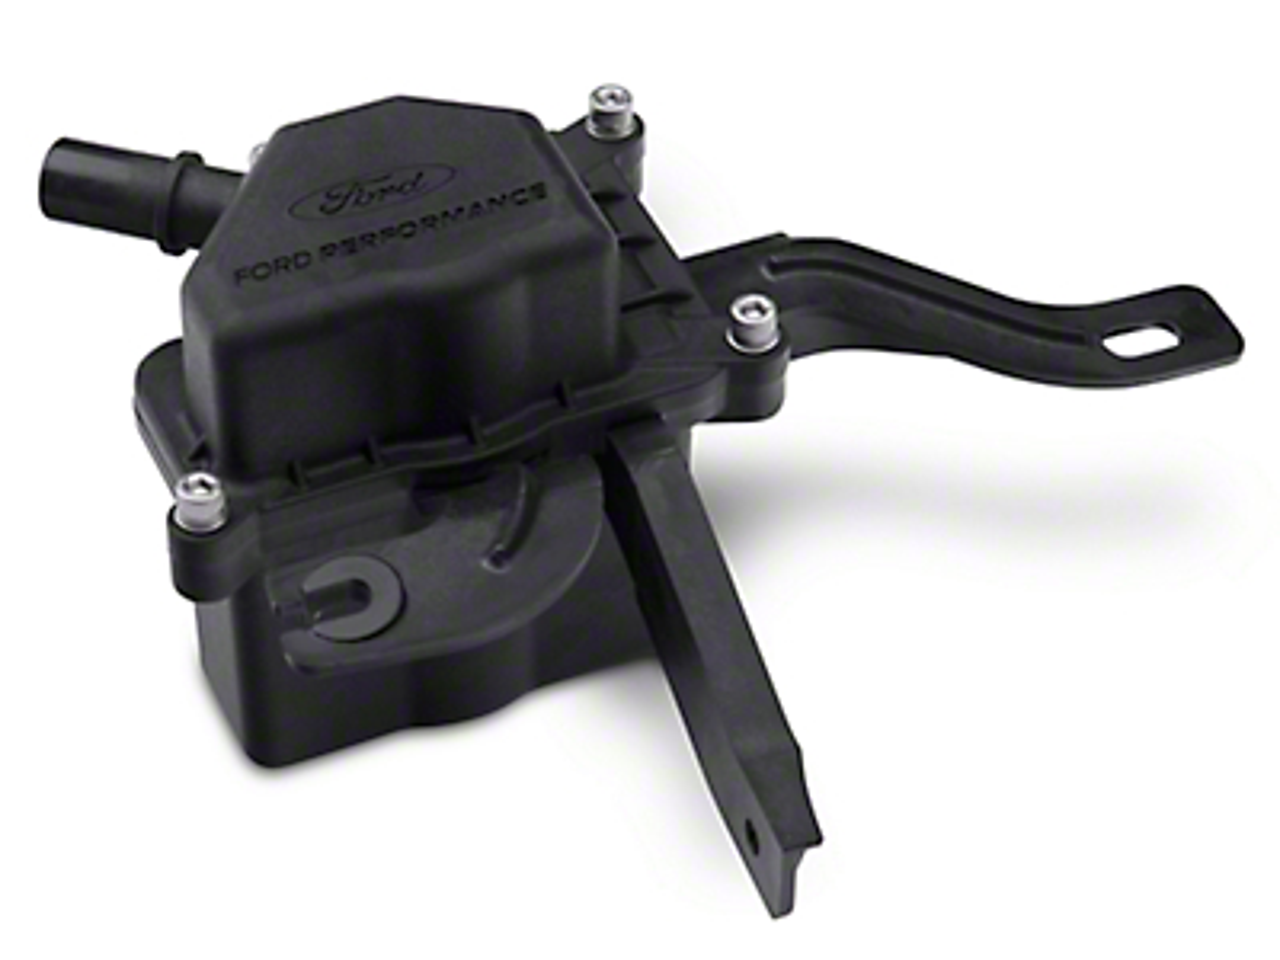 Ford Performance Oil-Air Separator (15-17 GT350, GT350R)